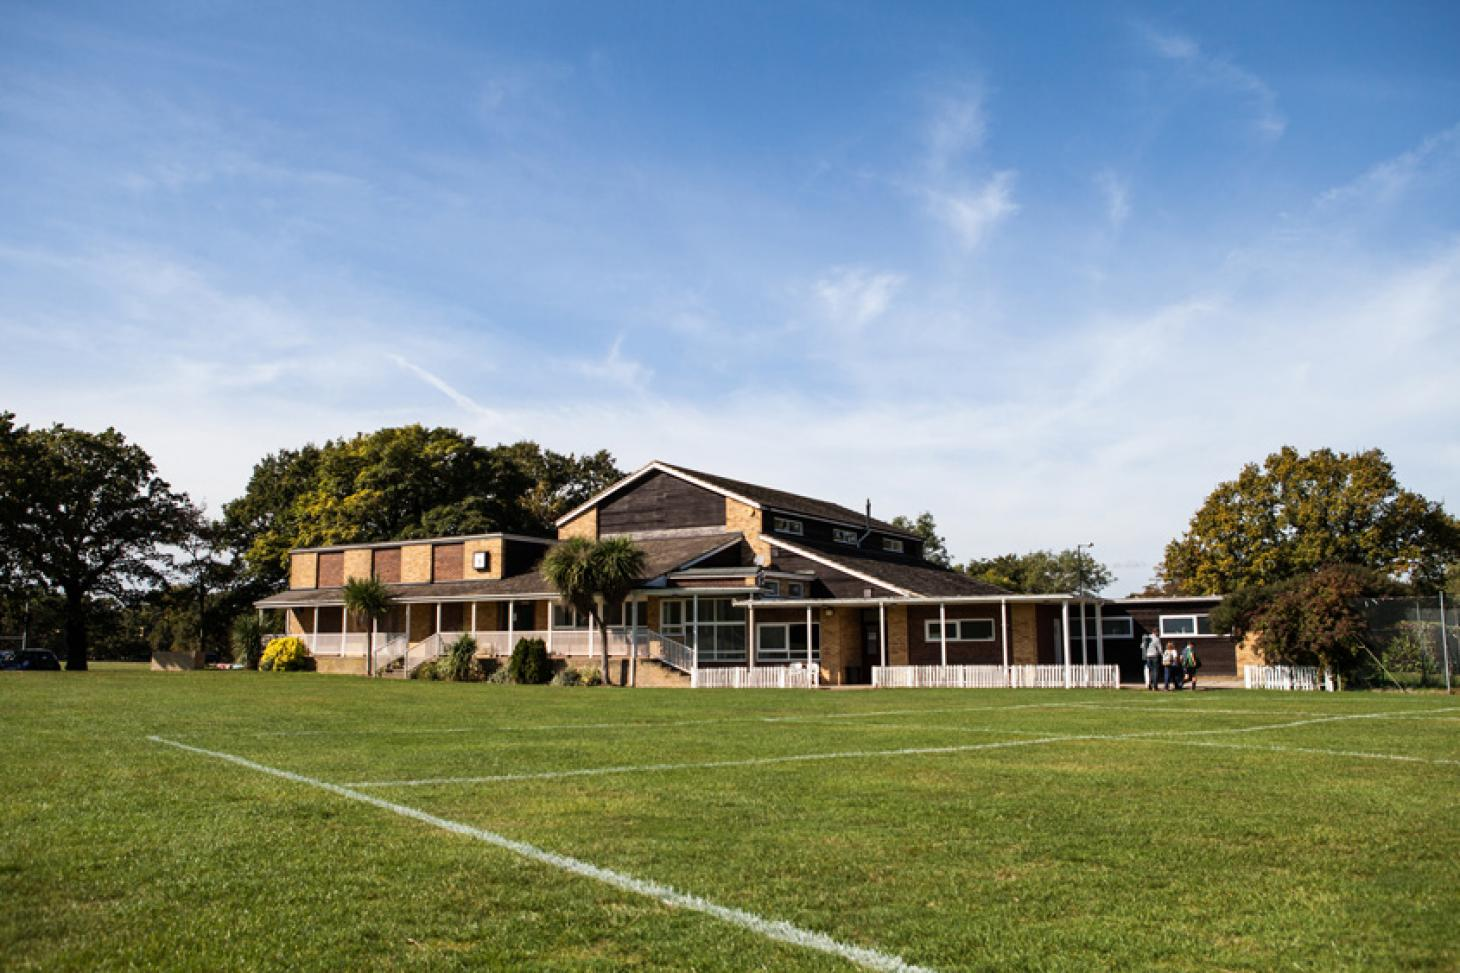 Trevor Bailey Sports Ground Union | Grass rugby pitch